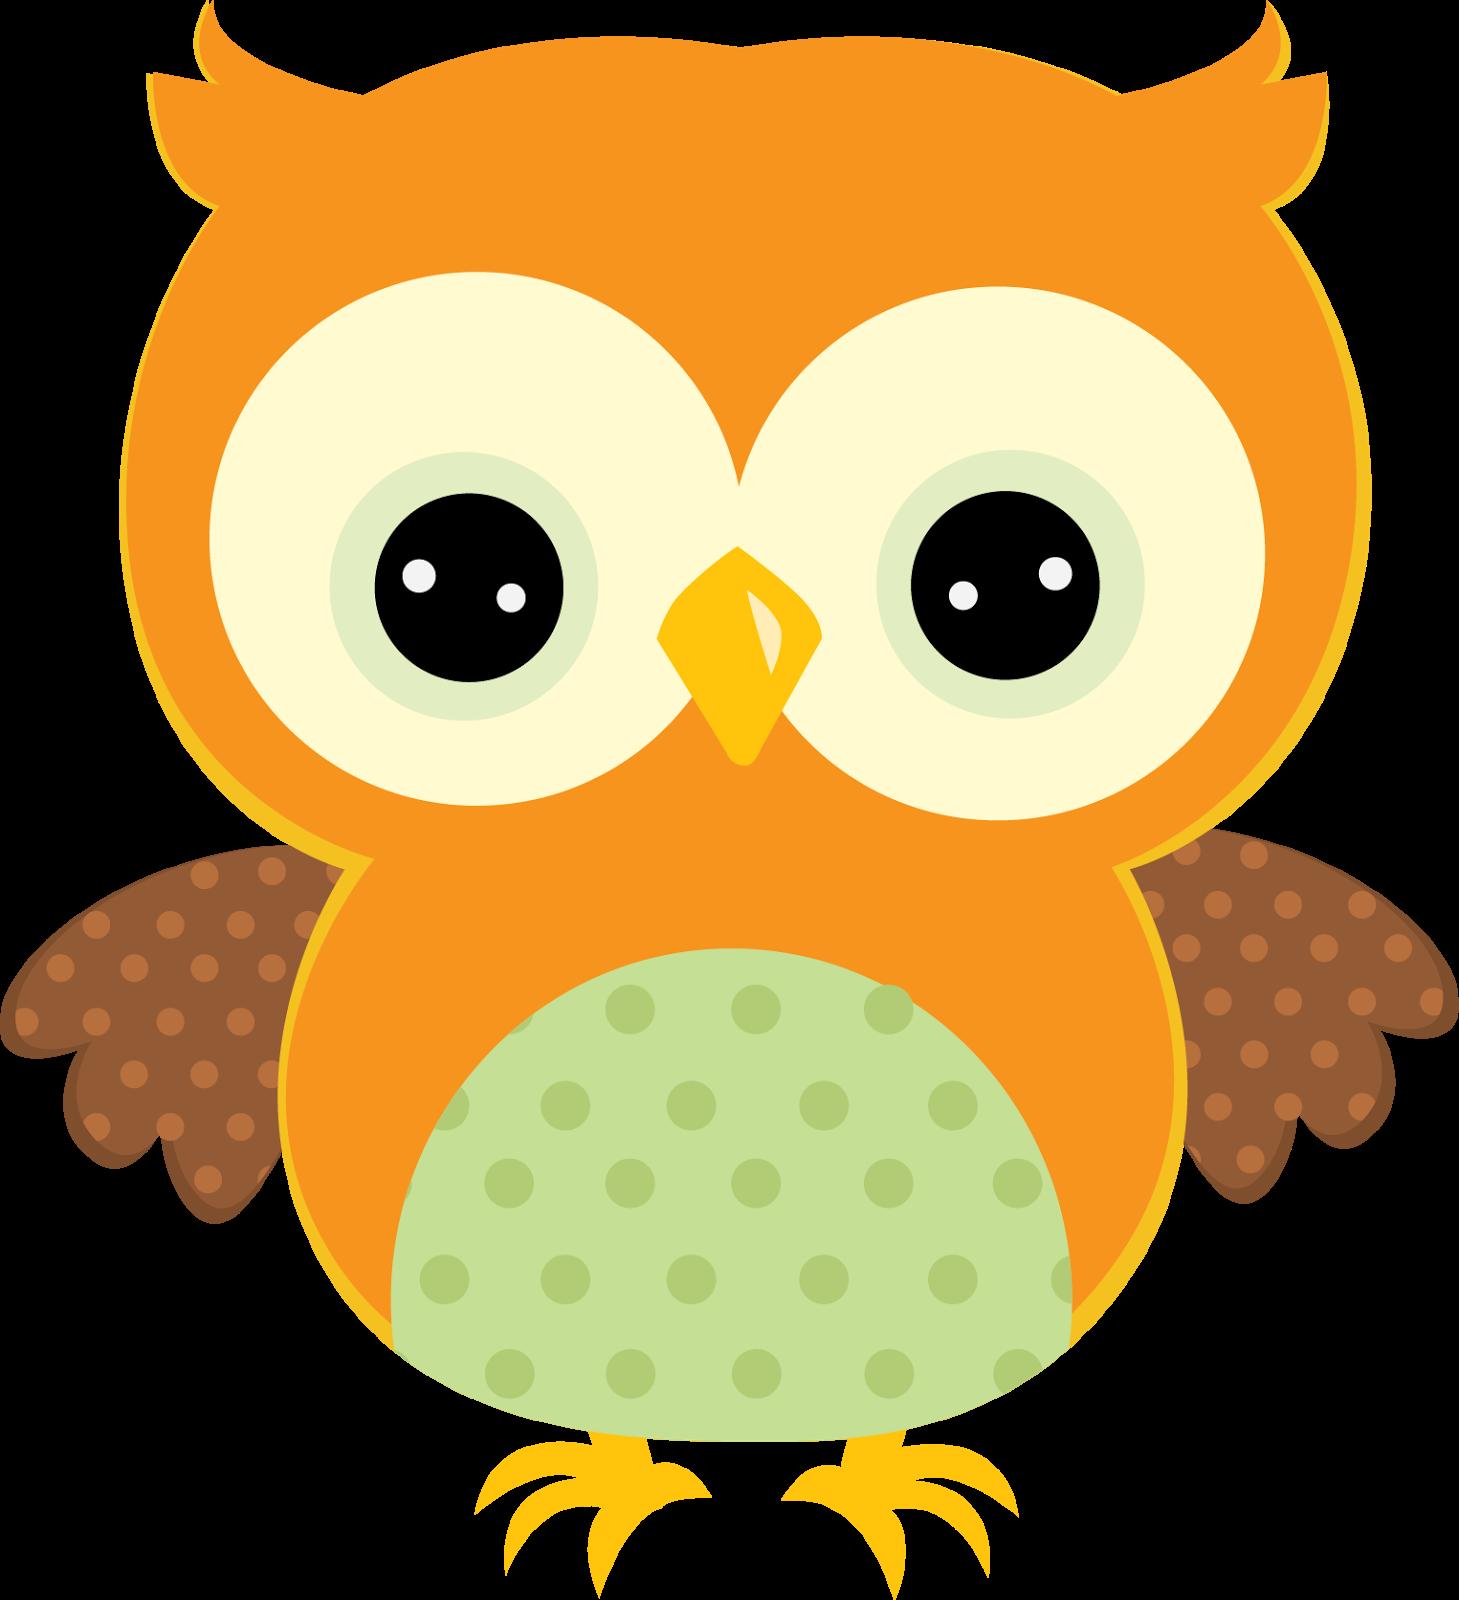 Star owl clipart png royalty free library IMÁGENES DE BÚHOS | ΕΤΙΚΕΤΕΣ OWL | Pinterest | Sewing appliques, Owl ... png royalty free library